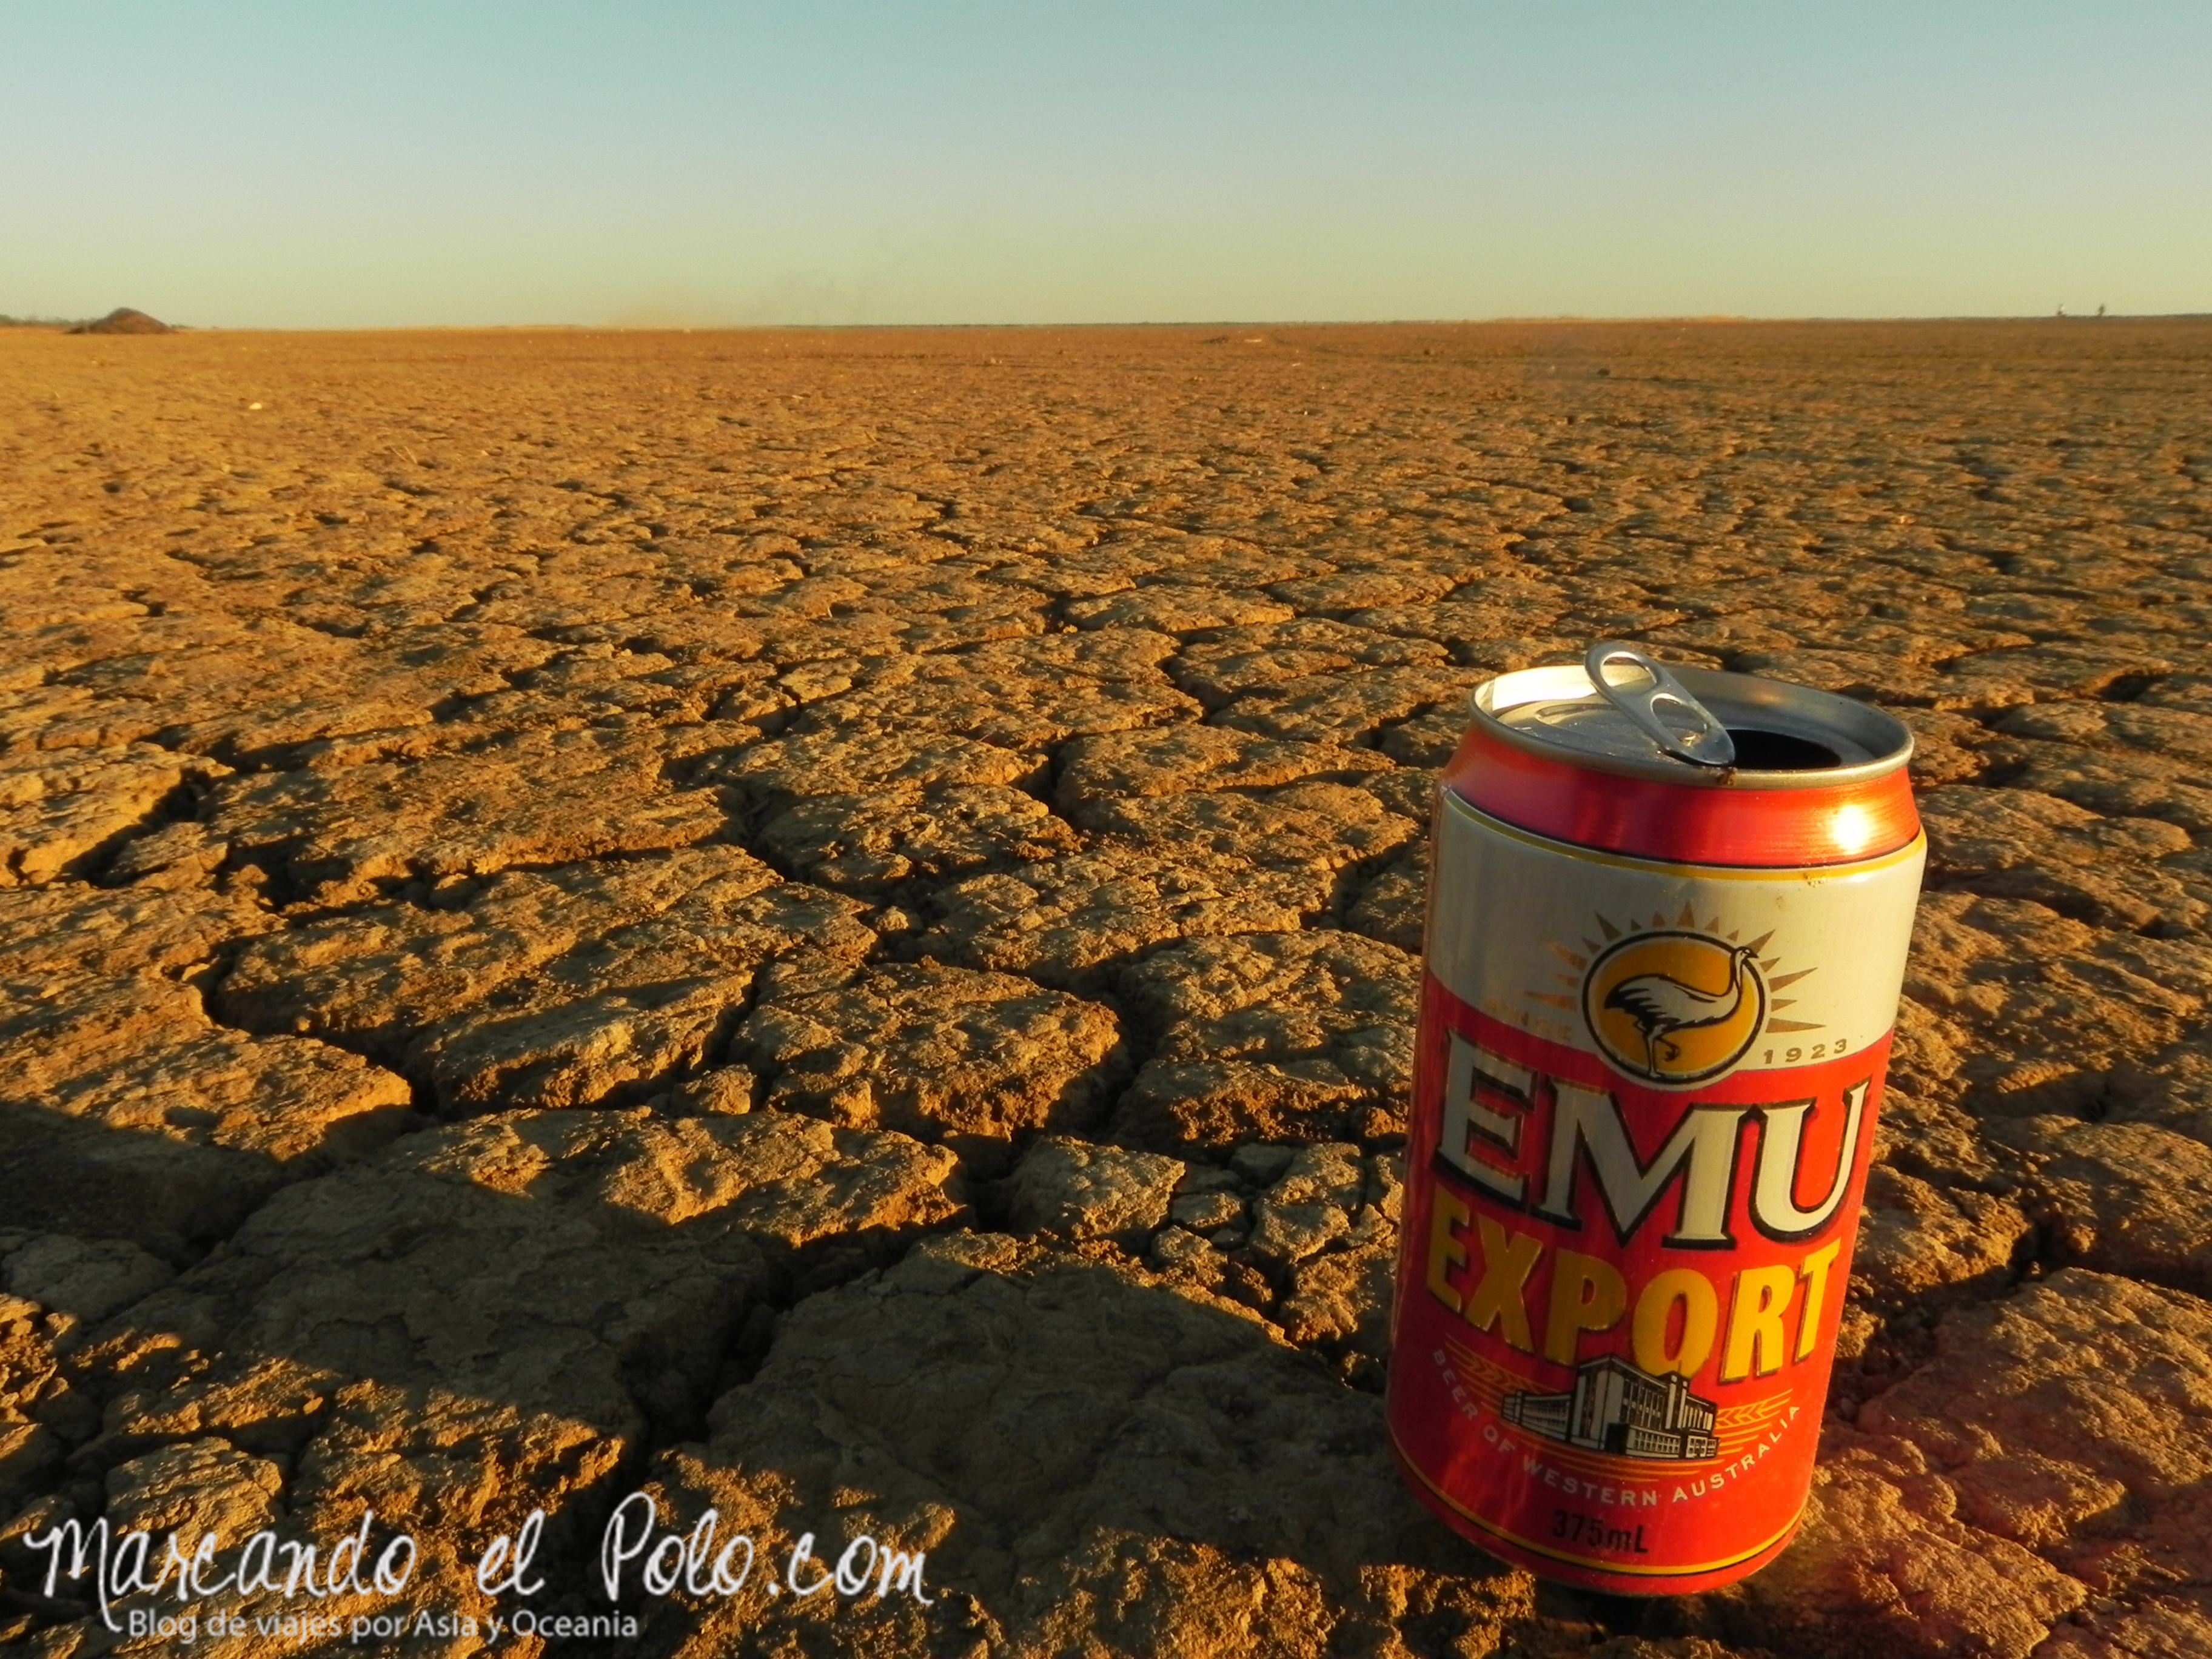 El lejano Oeste australiano: Emu beer